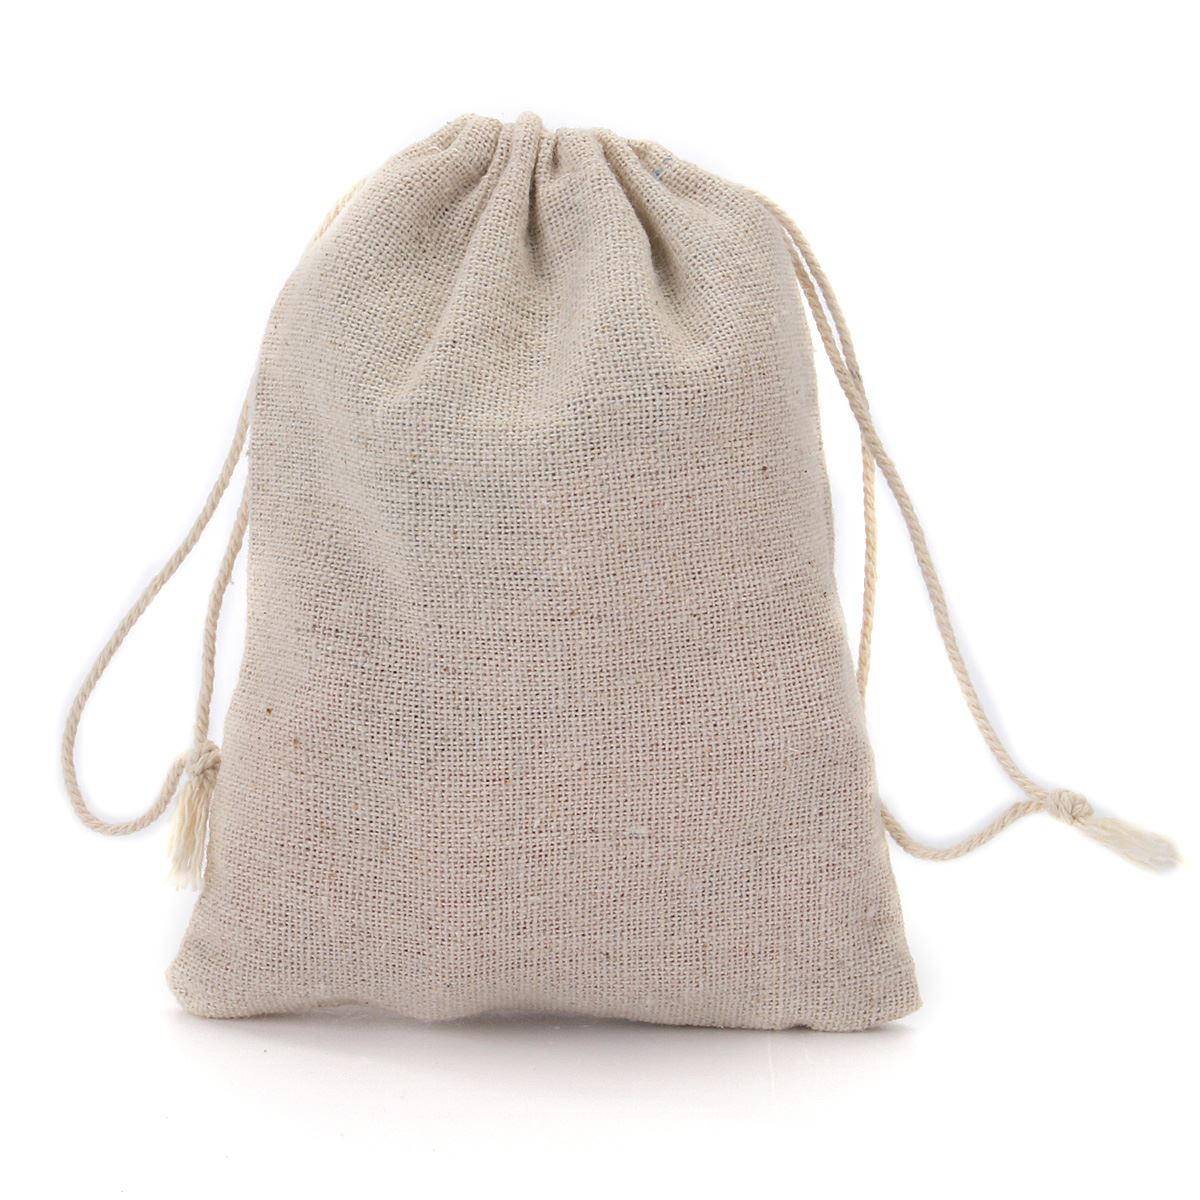 10pcs/bag Cotton Bag With Drawstrings Mini Linen Storage Bag Can Organize Sundries Small Eco Bags For Home(China (Mainland))